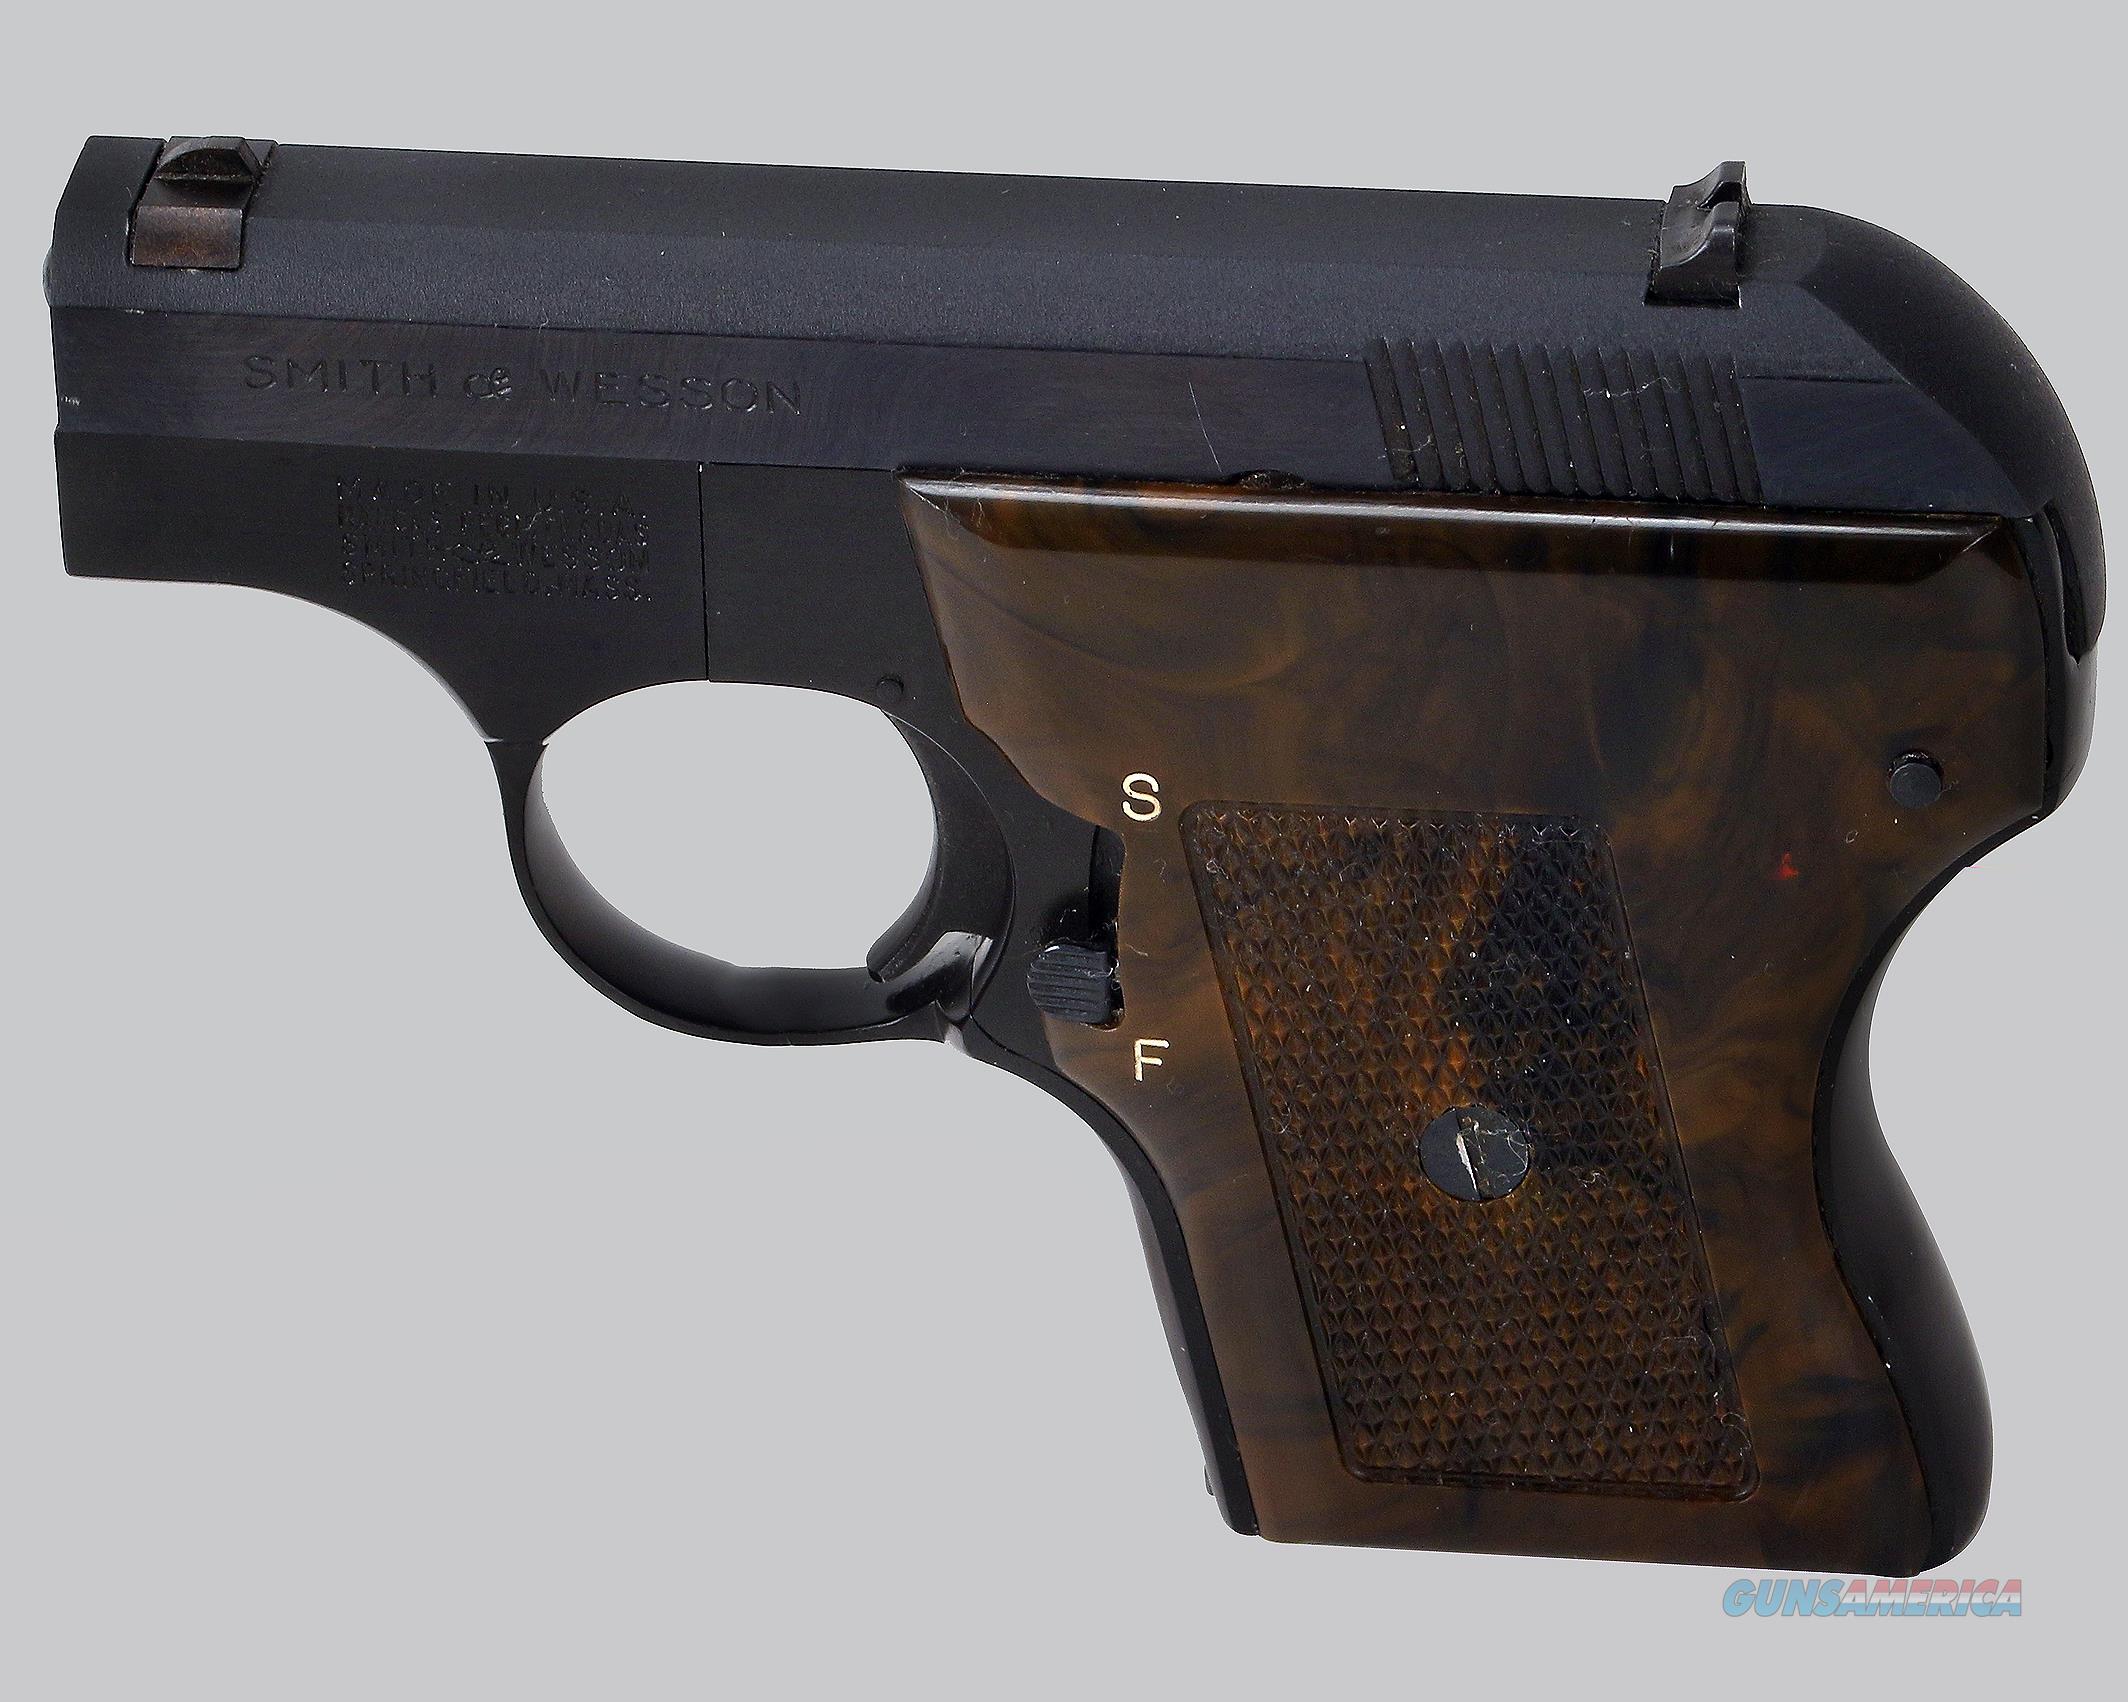 Smith & Wesson 22LR Model 61-2 Pistol  Guns > Pistols > Smith & Wesson Pistols - Autos > .22 Autos